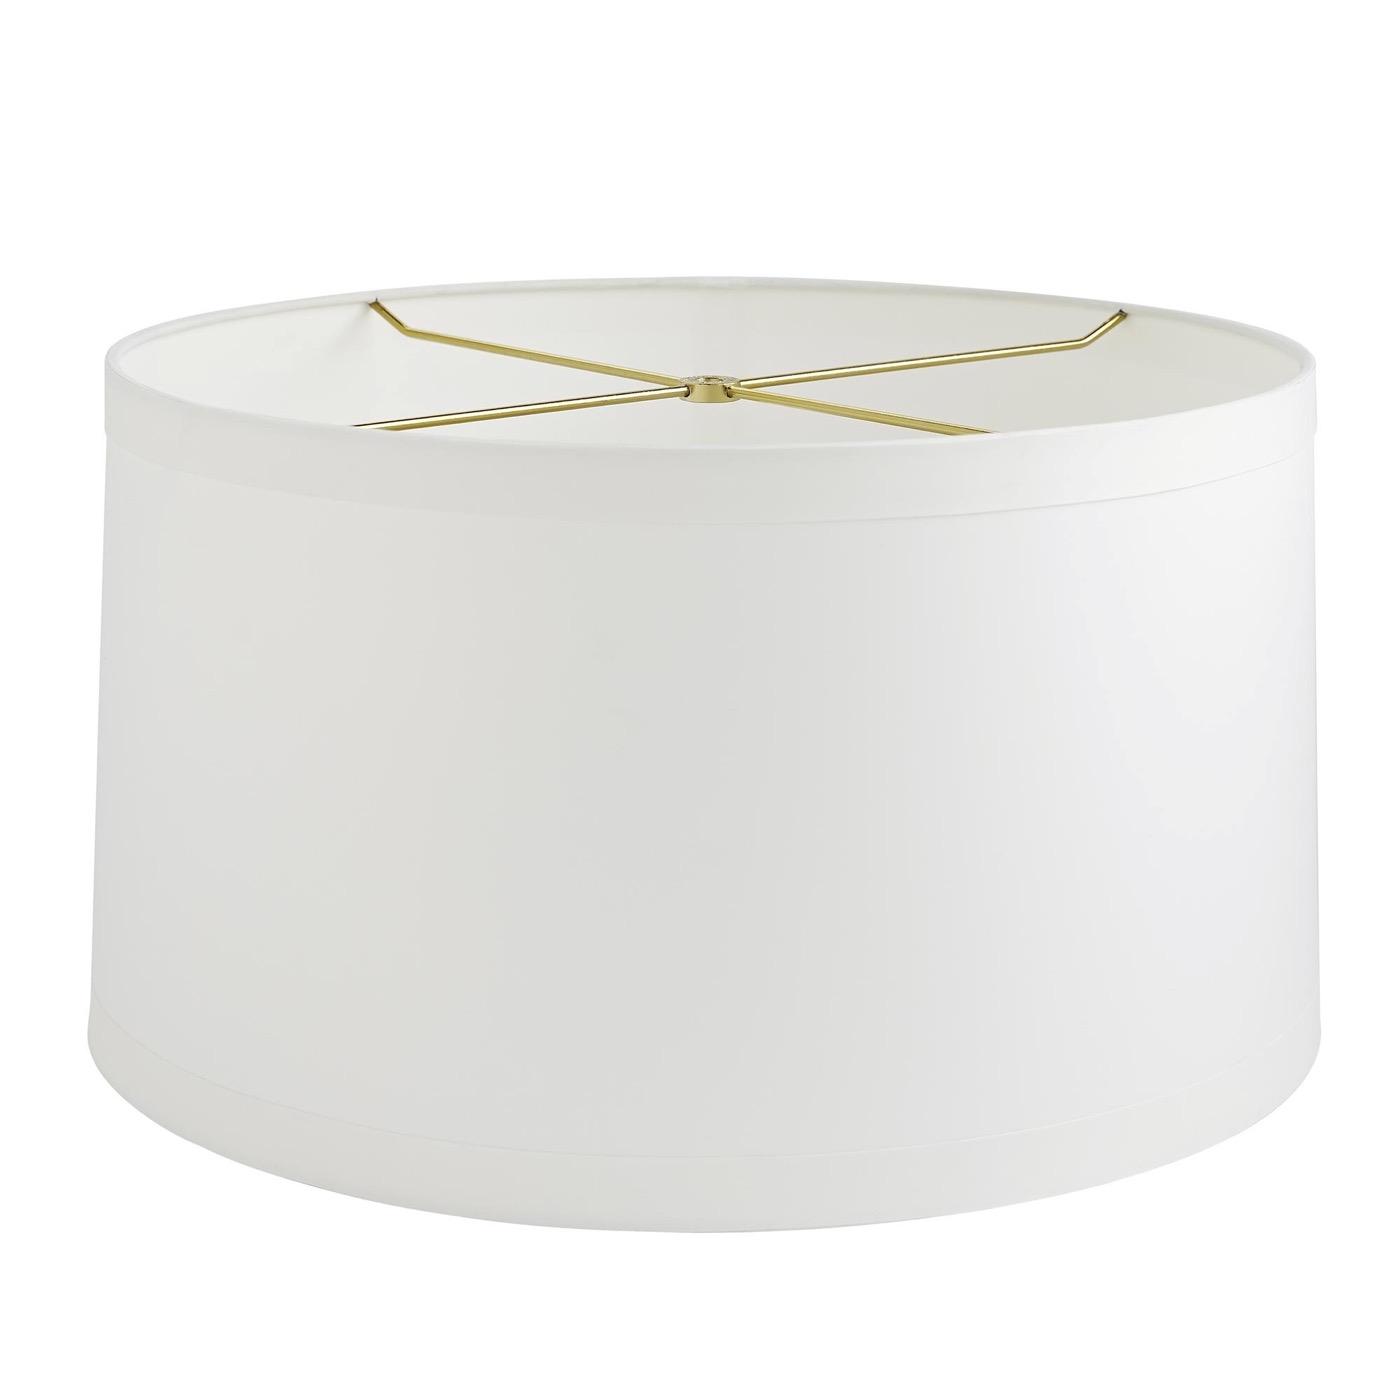 Stein Black & Brass Table Lamp